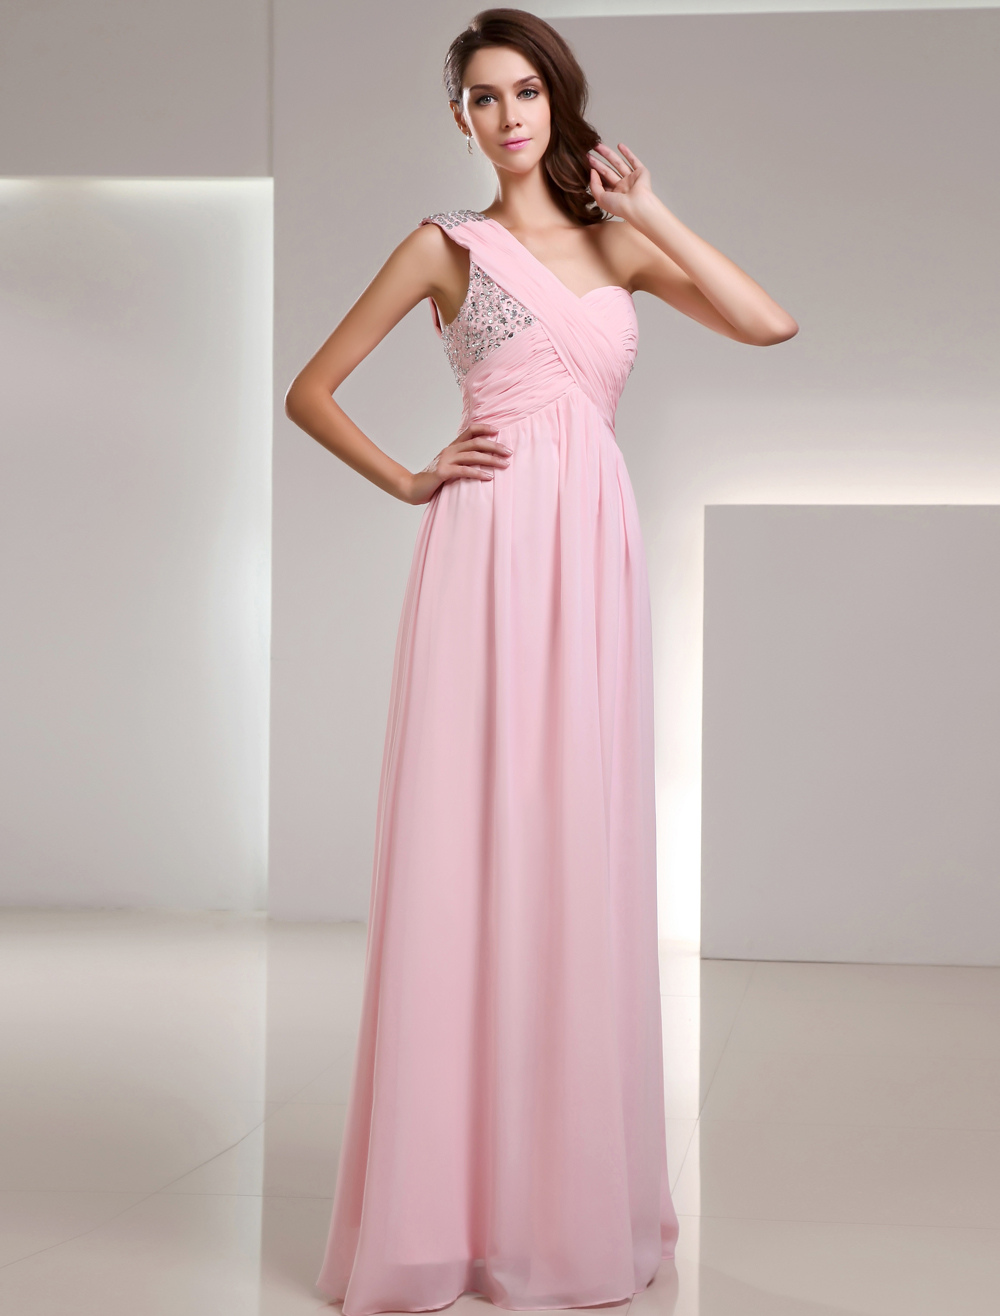 Pink One-Shoulder Sequin Chiffon Prom Dress (Wedding Prom Dresses) photo